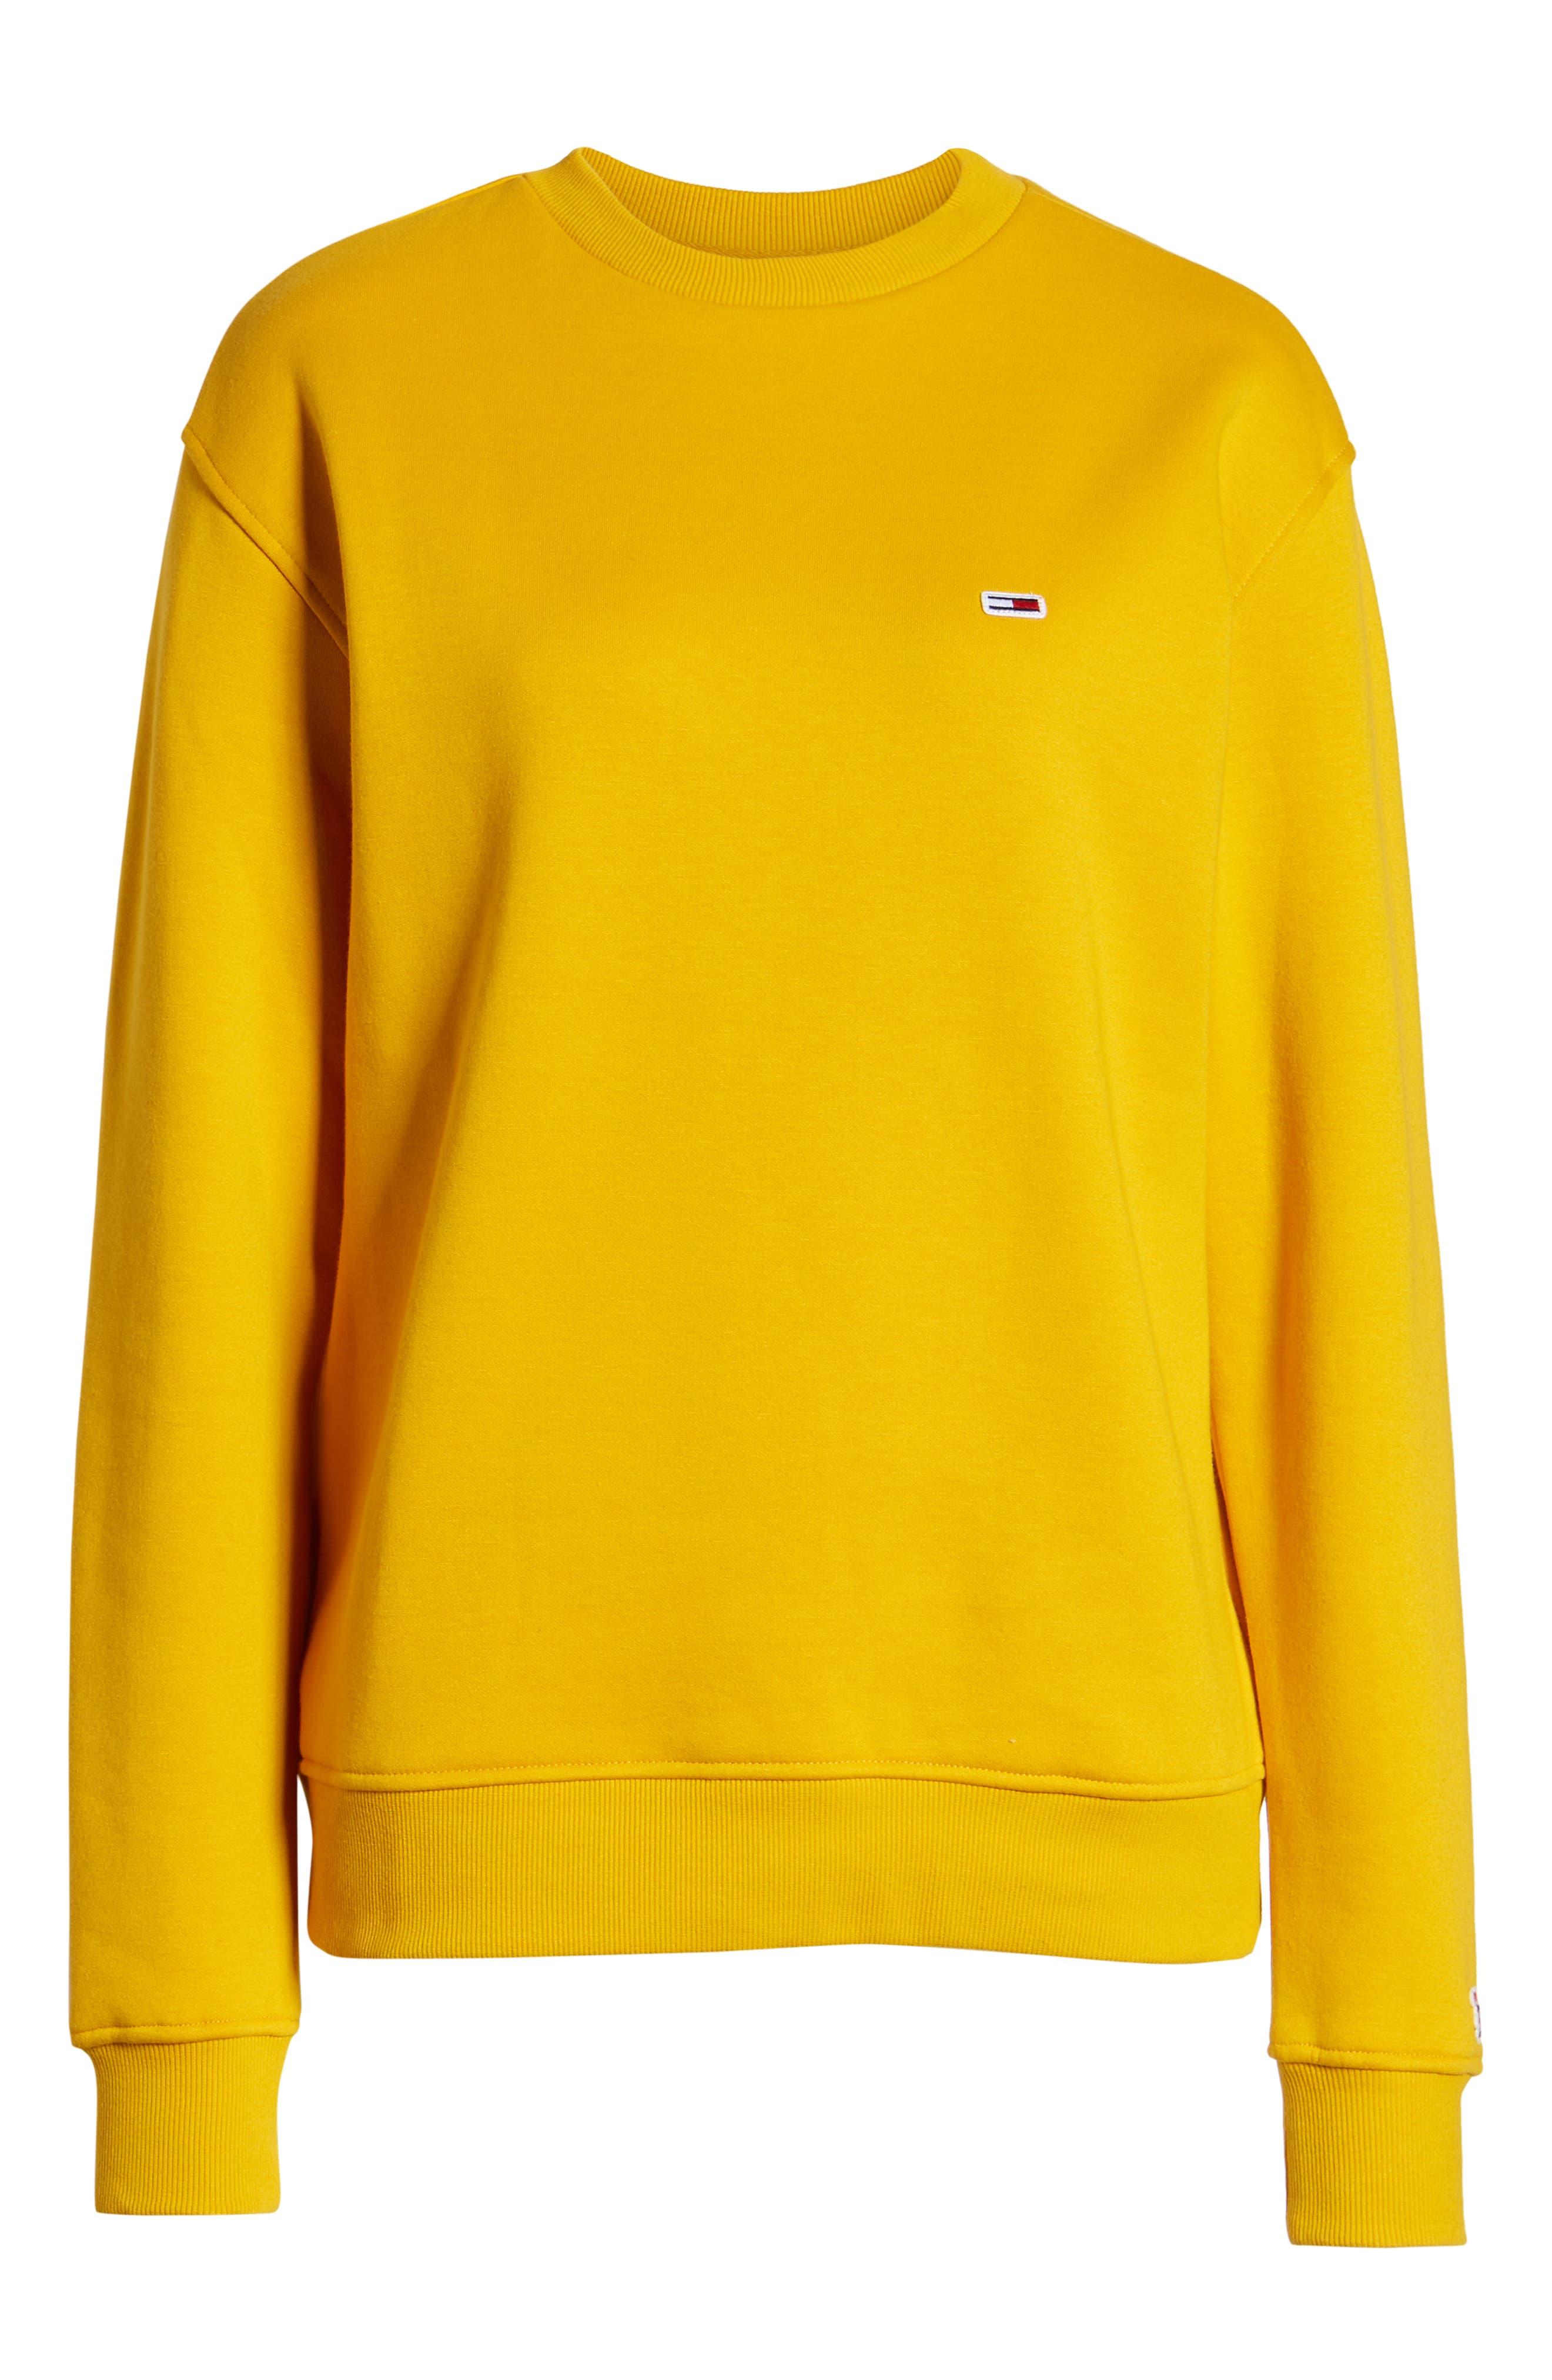 TJW Tommy Classics Sweatshirt,                             Alternate thumbnail 6, color,                             701